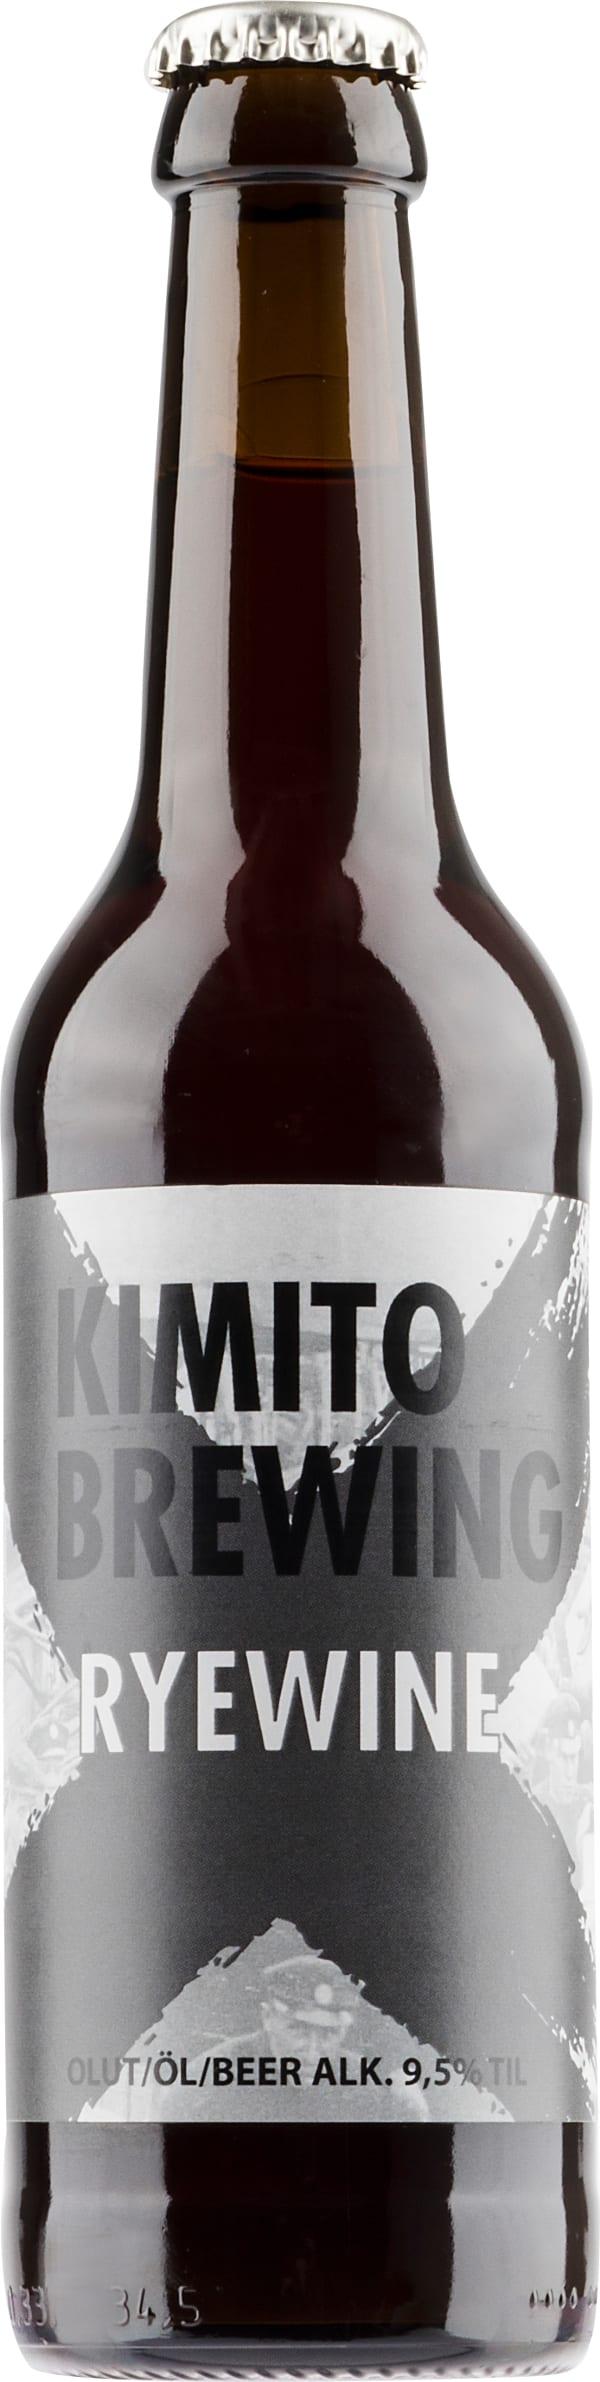 Kimito RyeWine